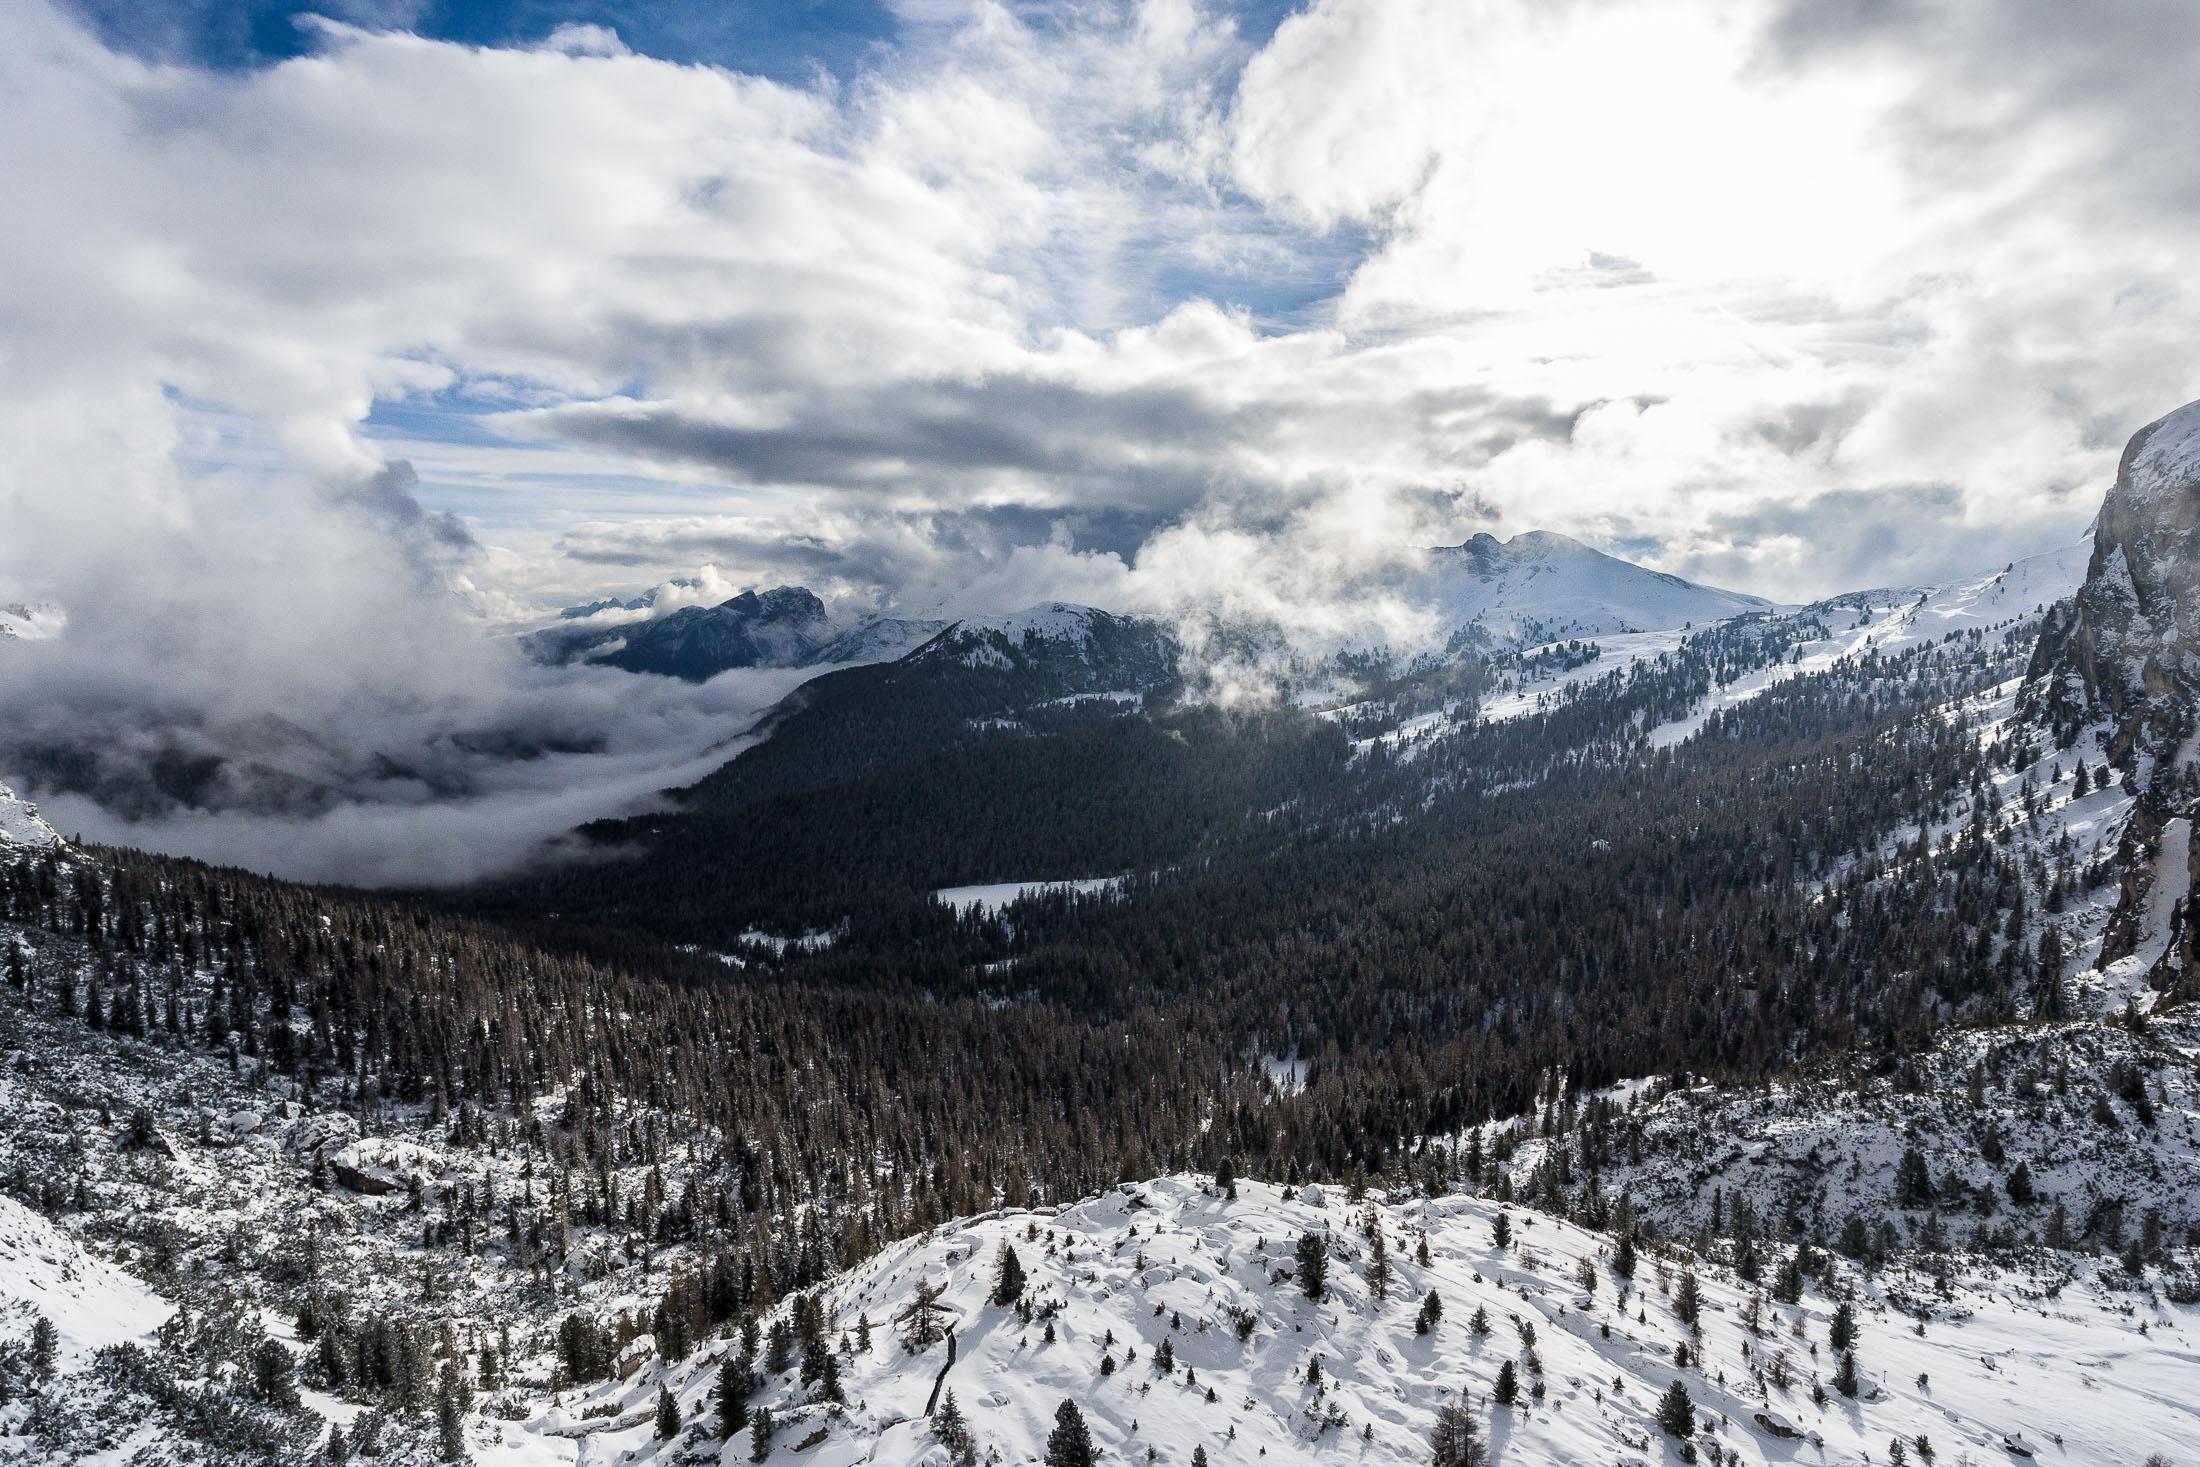 Above Dolomites, Italy